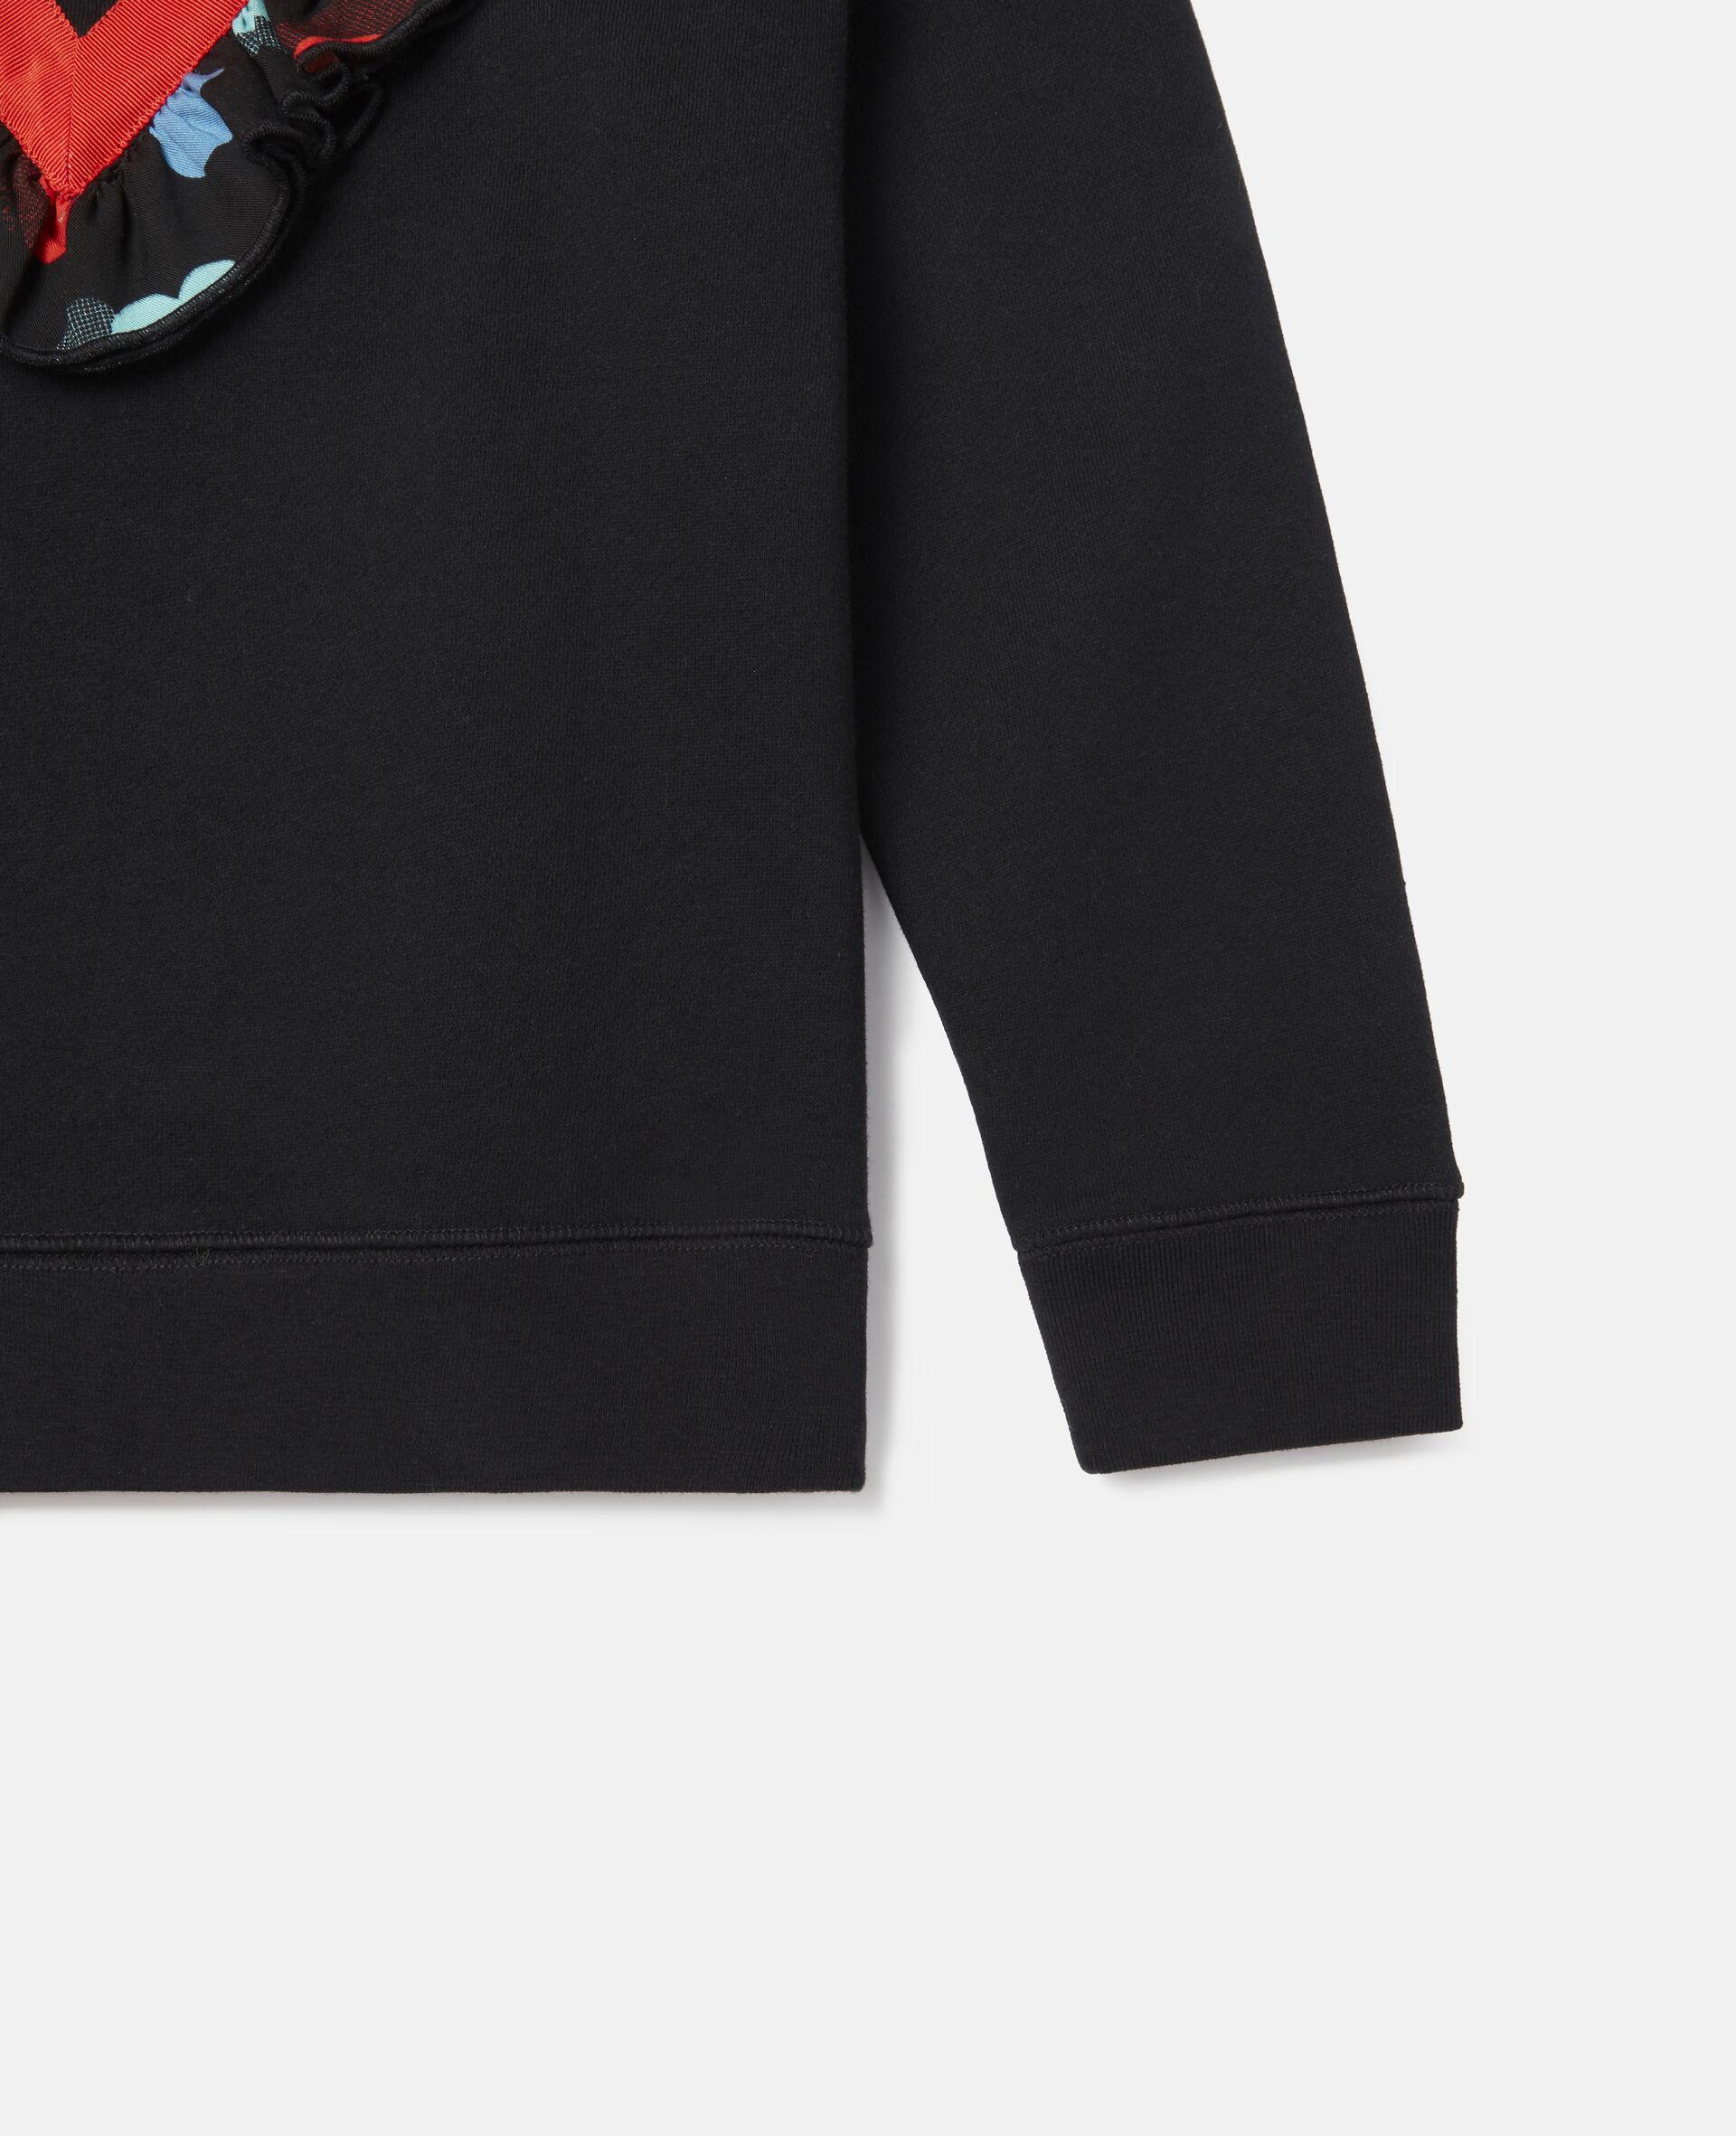 Frilled Fleece Sweatshirt -Black-large image number 2